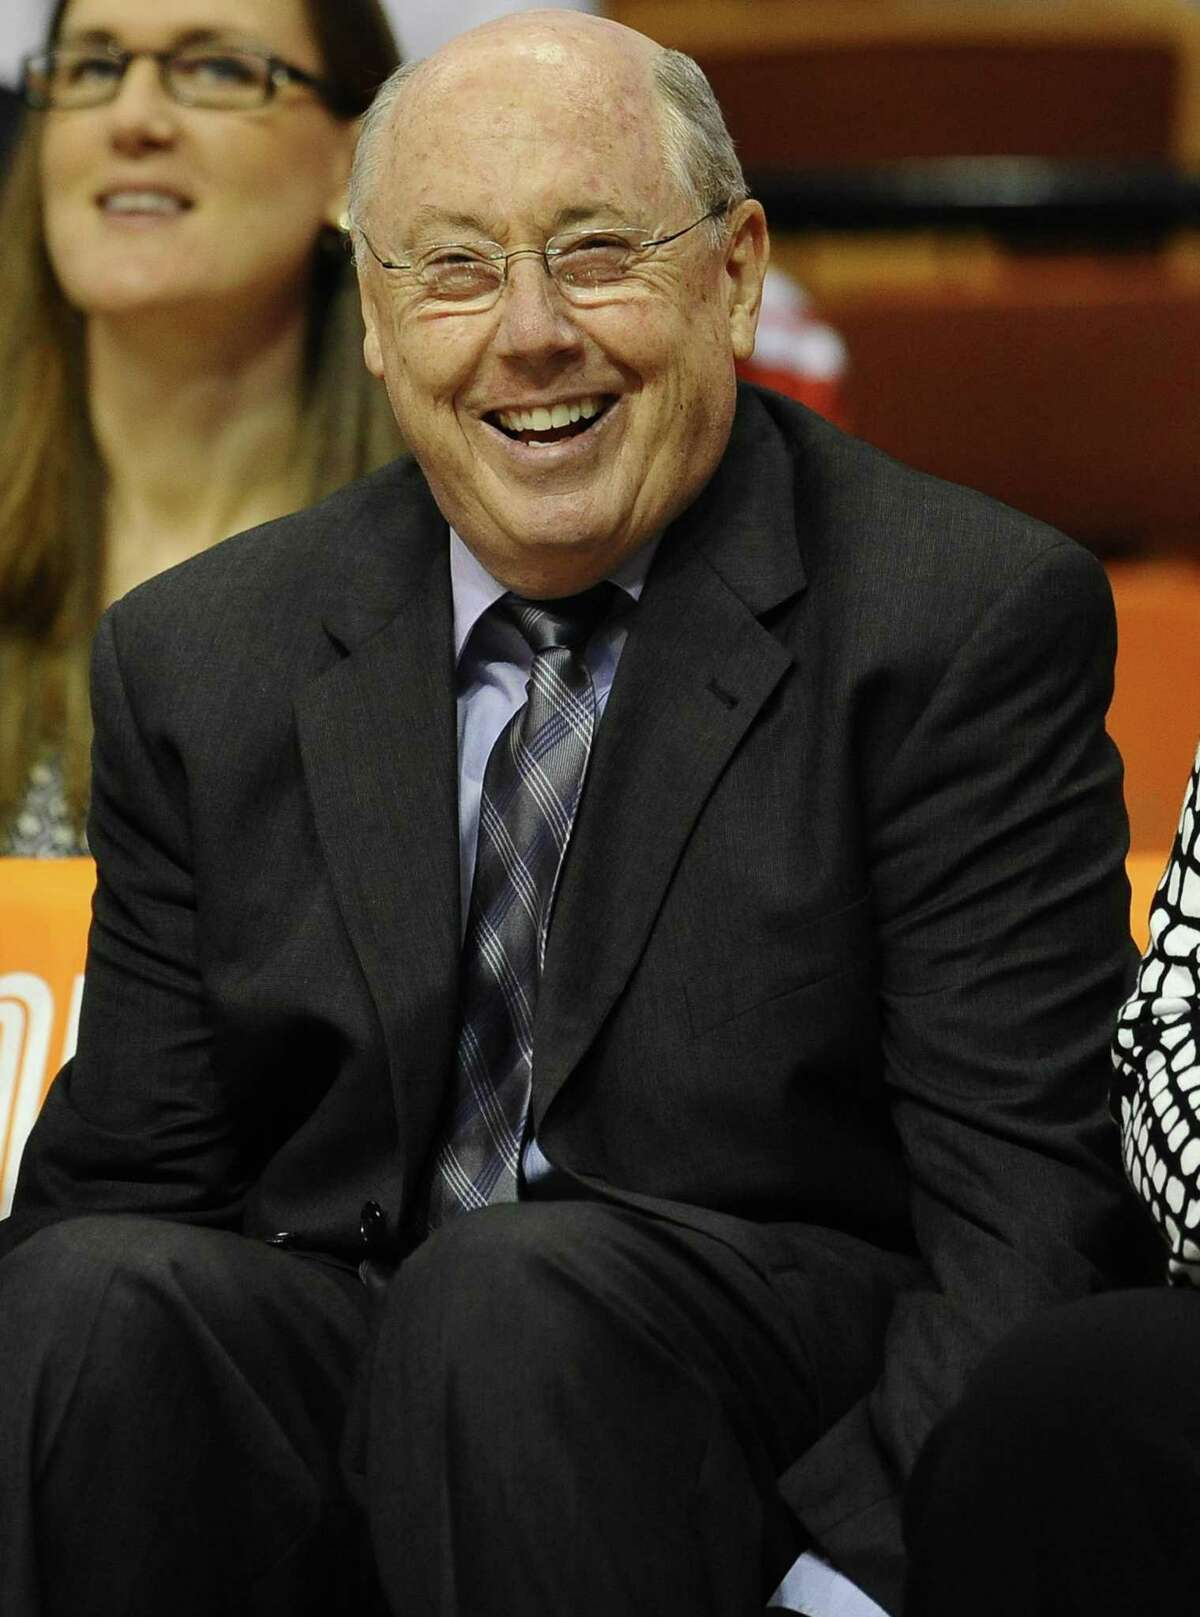 Washington Mystics head coach Mike Thibault. (AP Photo/Jessica Hill)